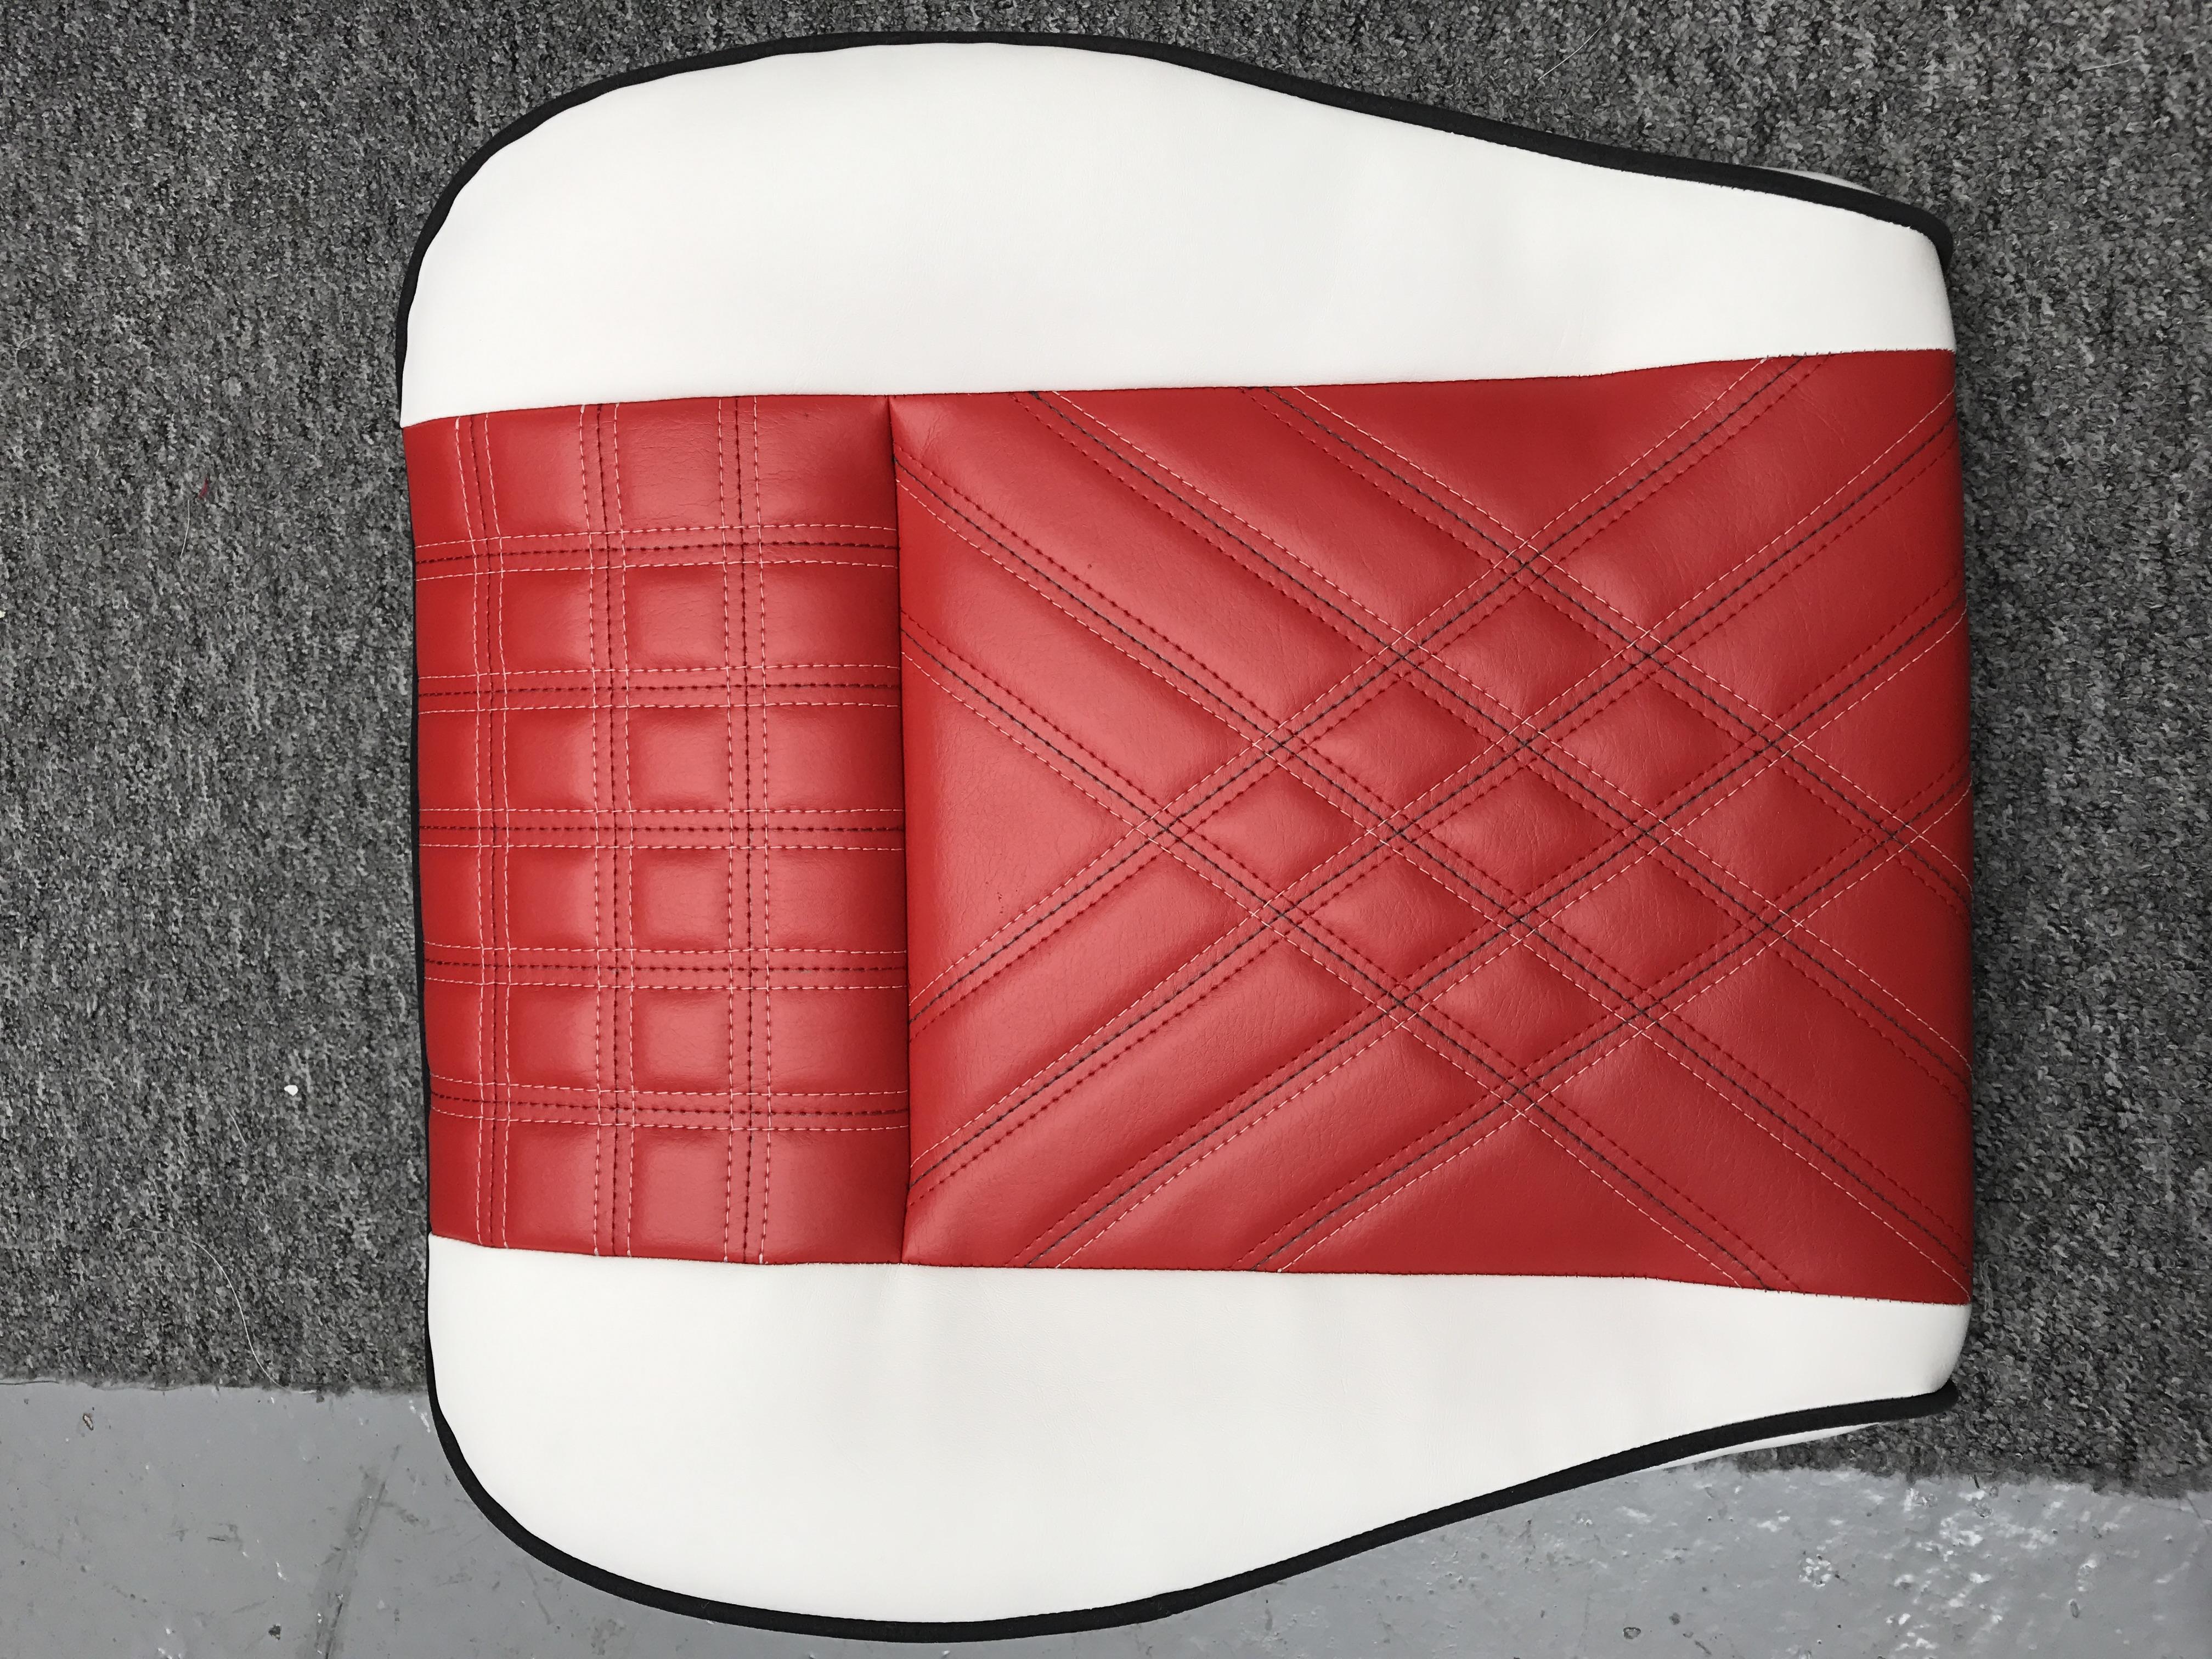 T4 seat base